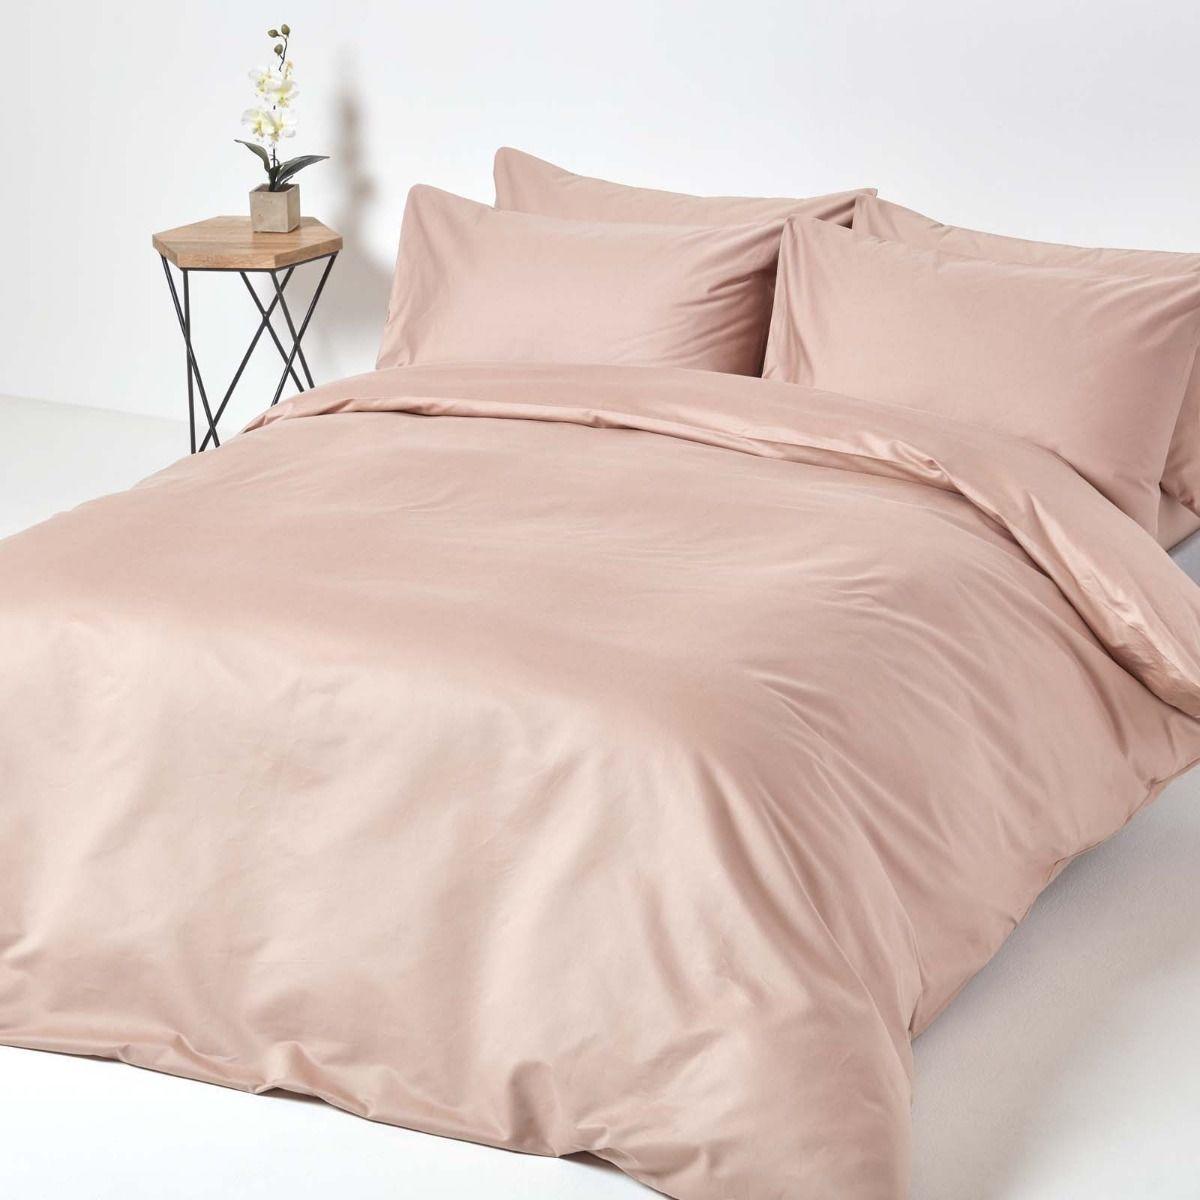 Egyptian Cotton Bedsheet Singapore SingaporeHomeFurniture